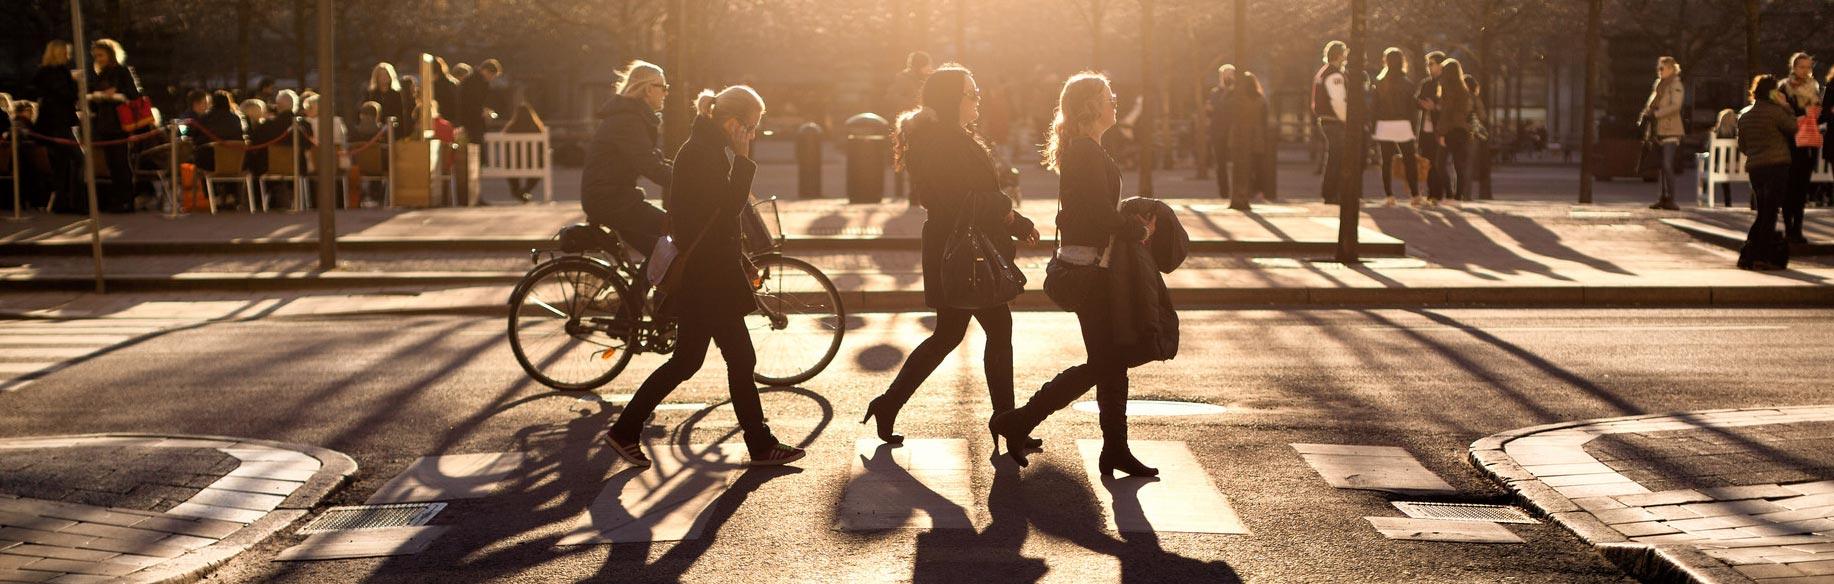 Vision Zero in Sweden. Pedestrians Crossing the Street.